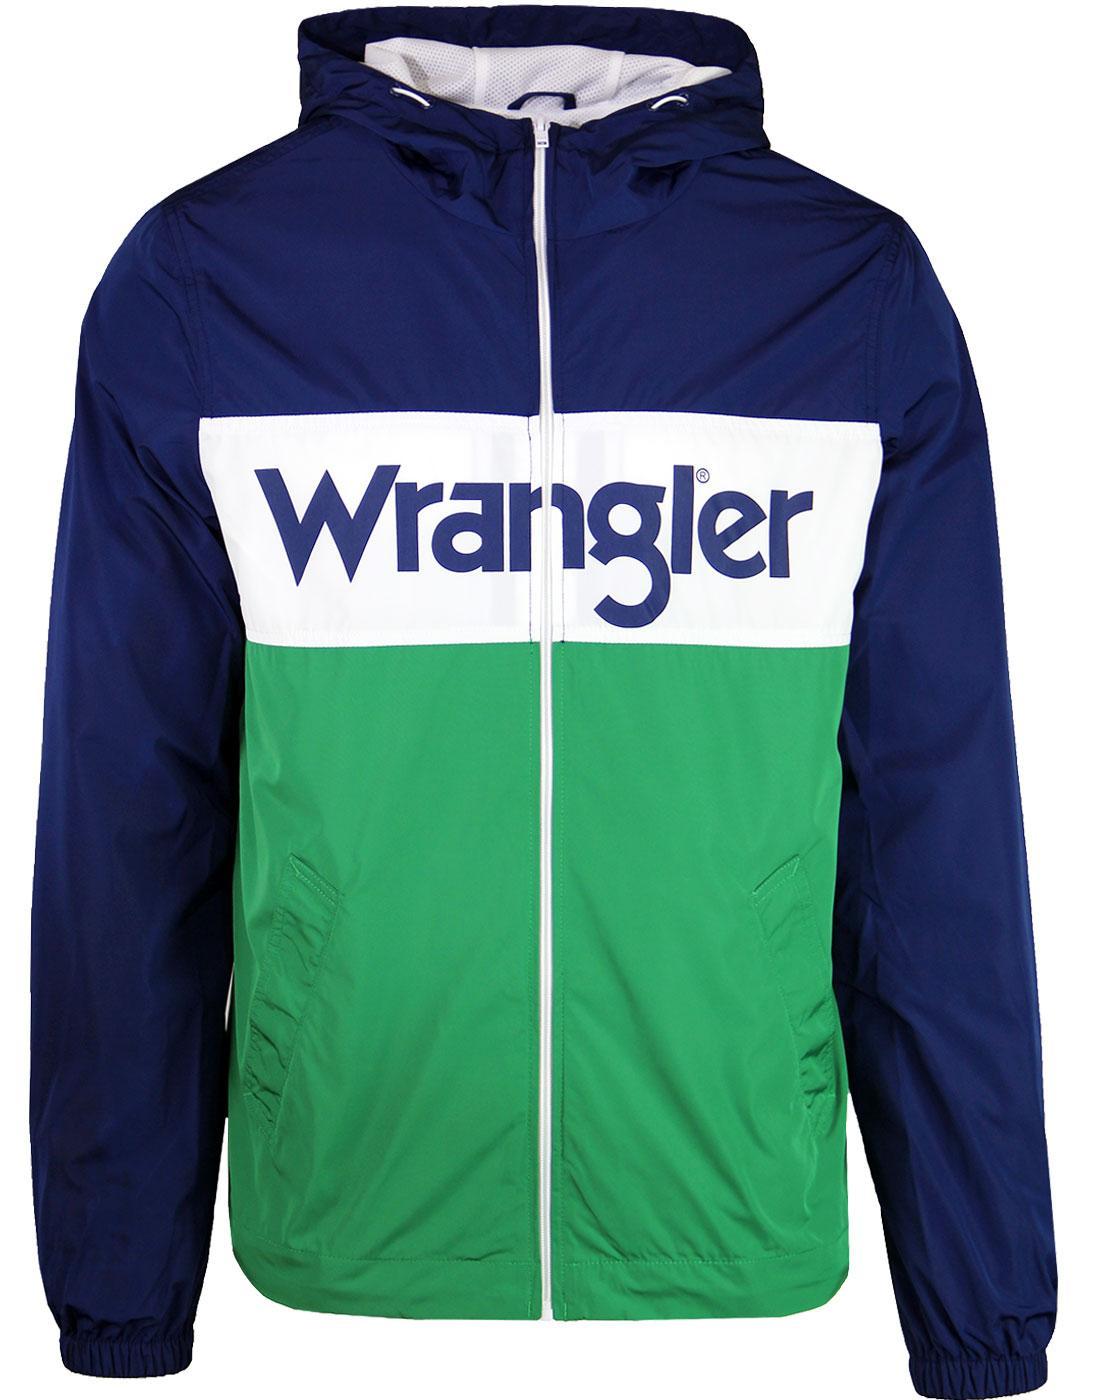 Wally WRANGLER Retro Indie Windbreaker Jacket